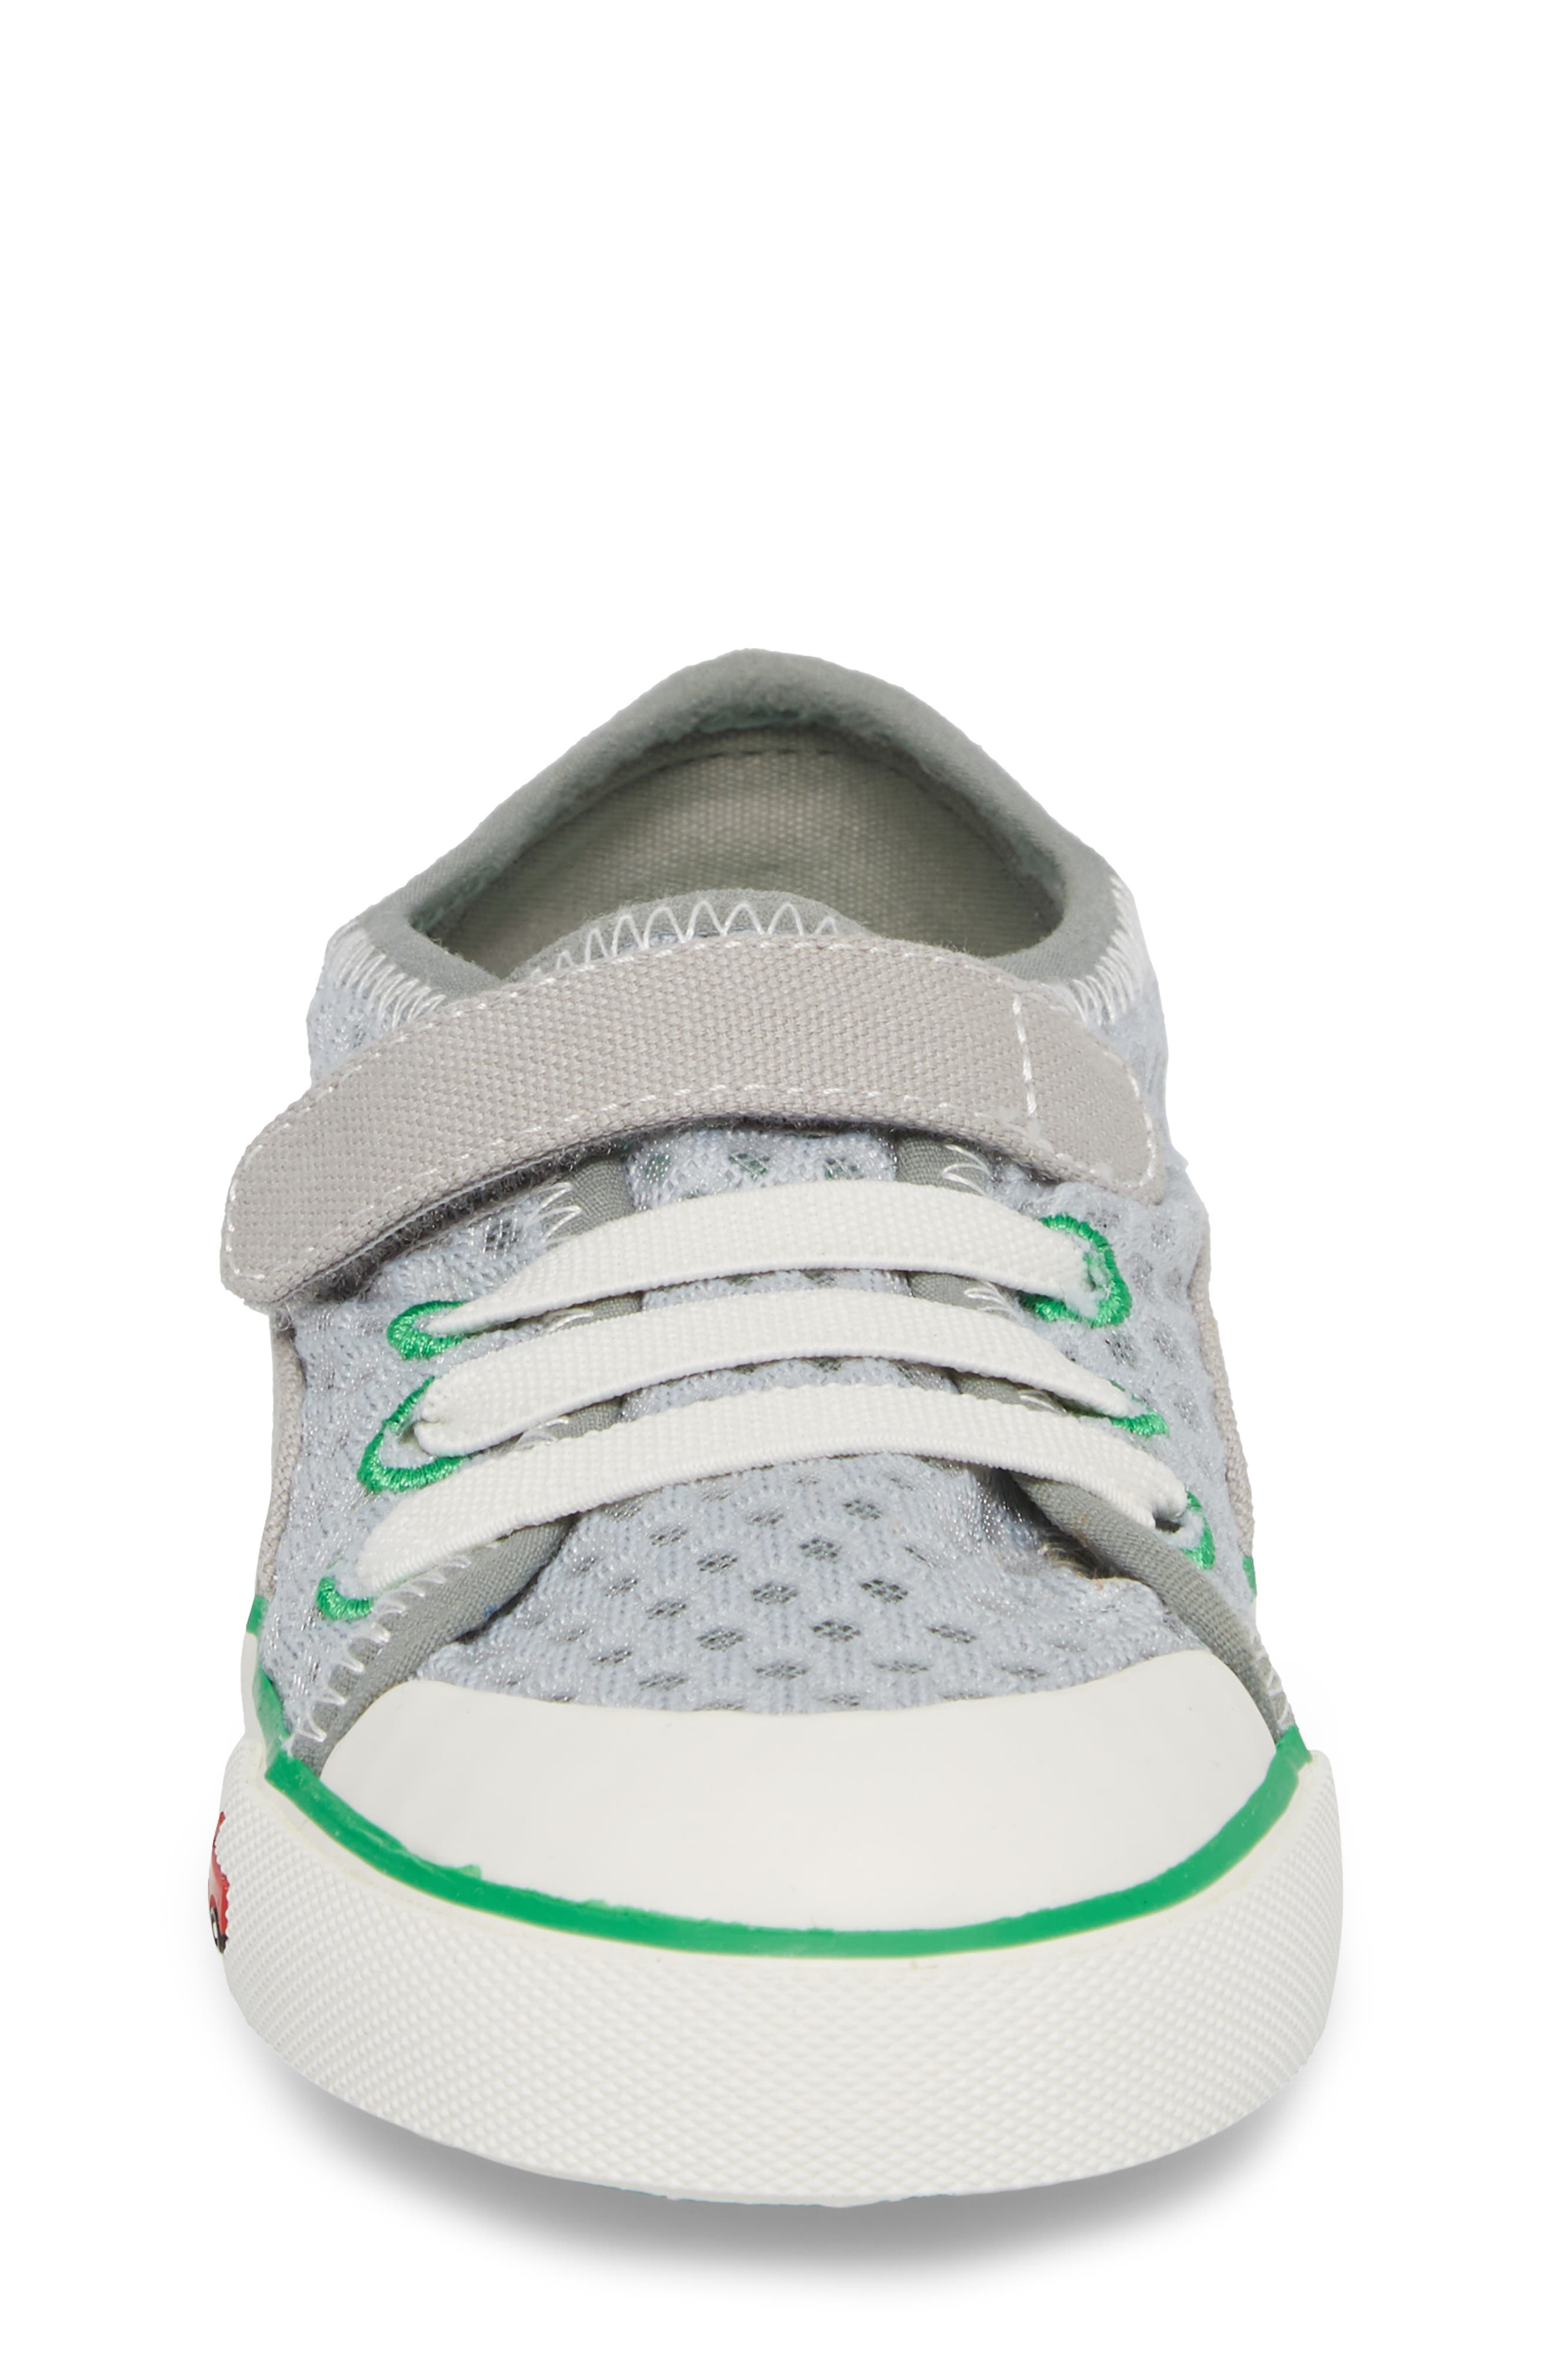 Saylor Sneaker,                             Alternate thumbnail 4, color,                             020